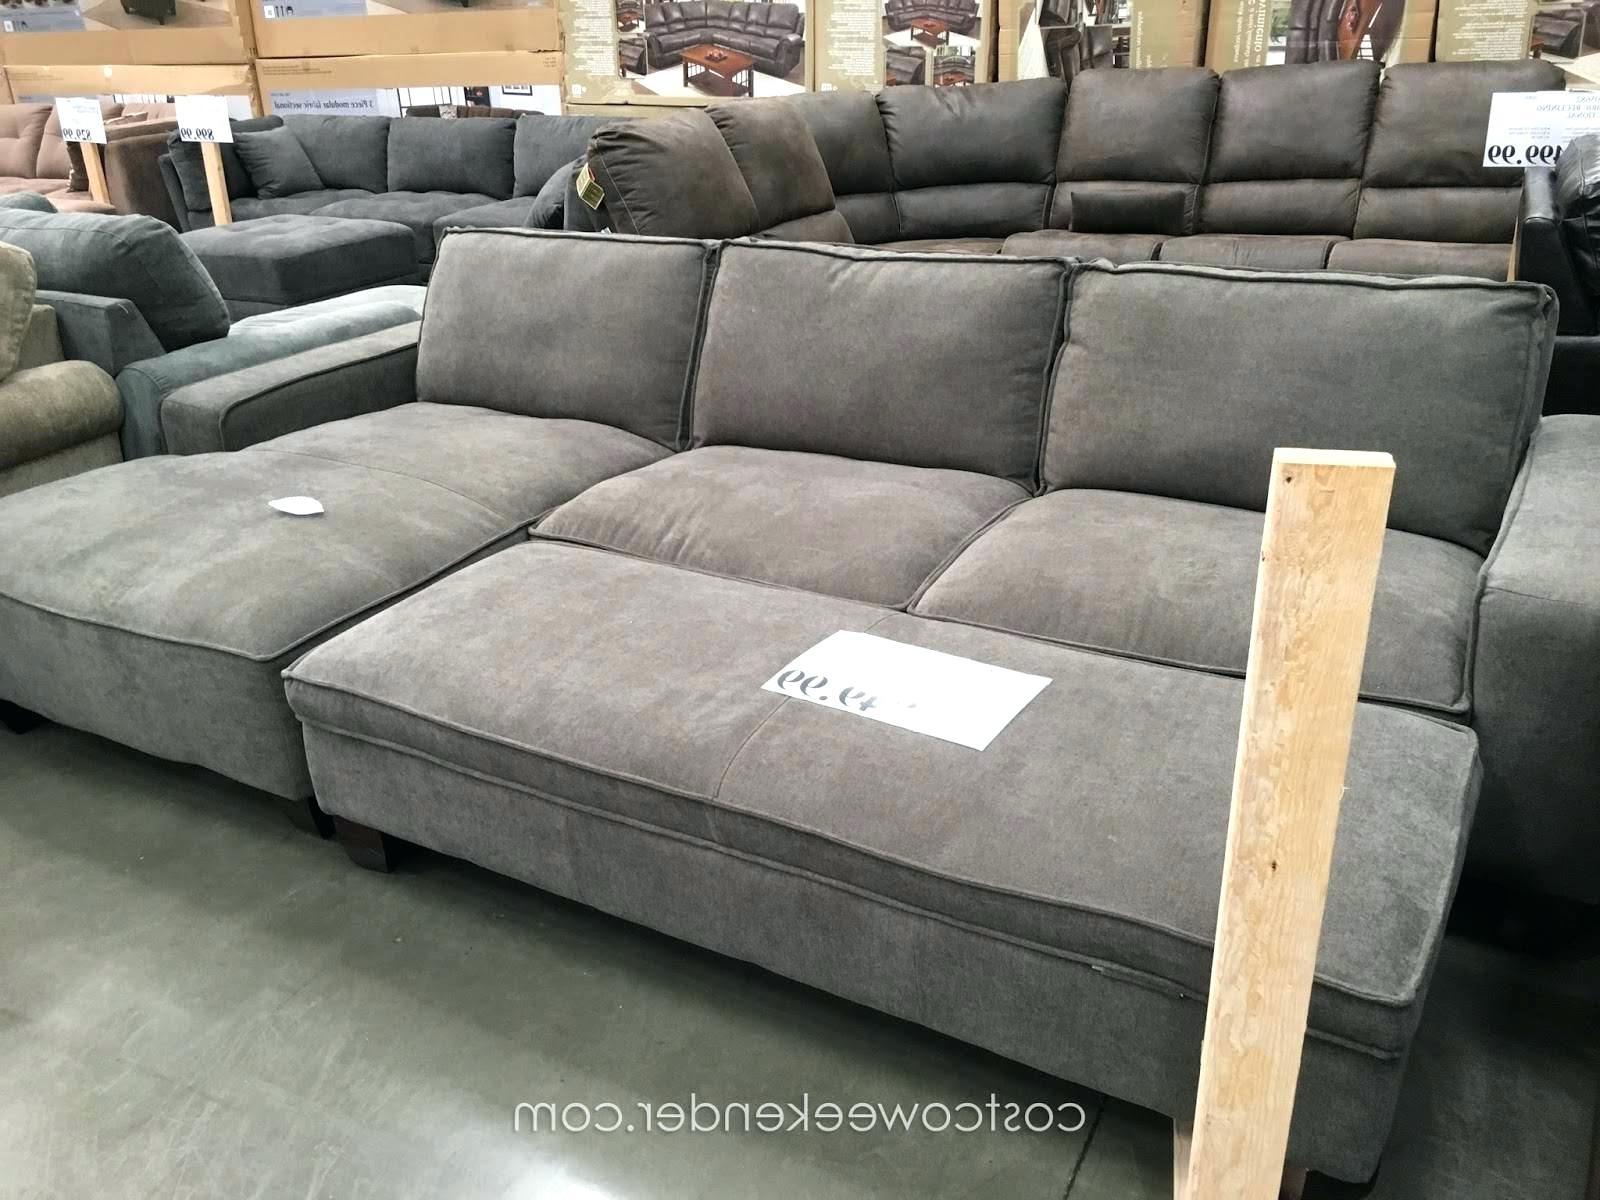 Latest Berkline Sofa Recliner Costco And Loveseat – Jasonatavastrealty In Berkline Sofas (View 10 of 20)